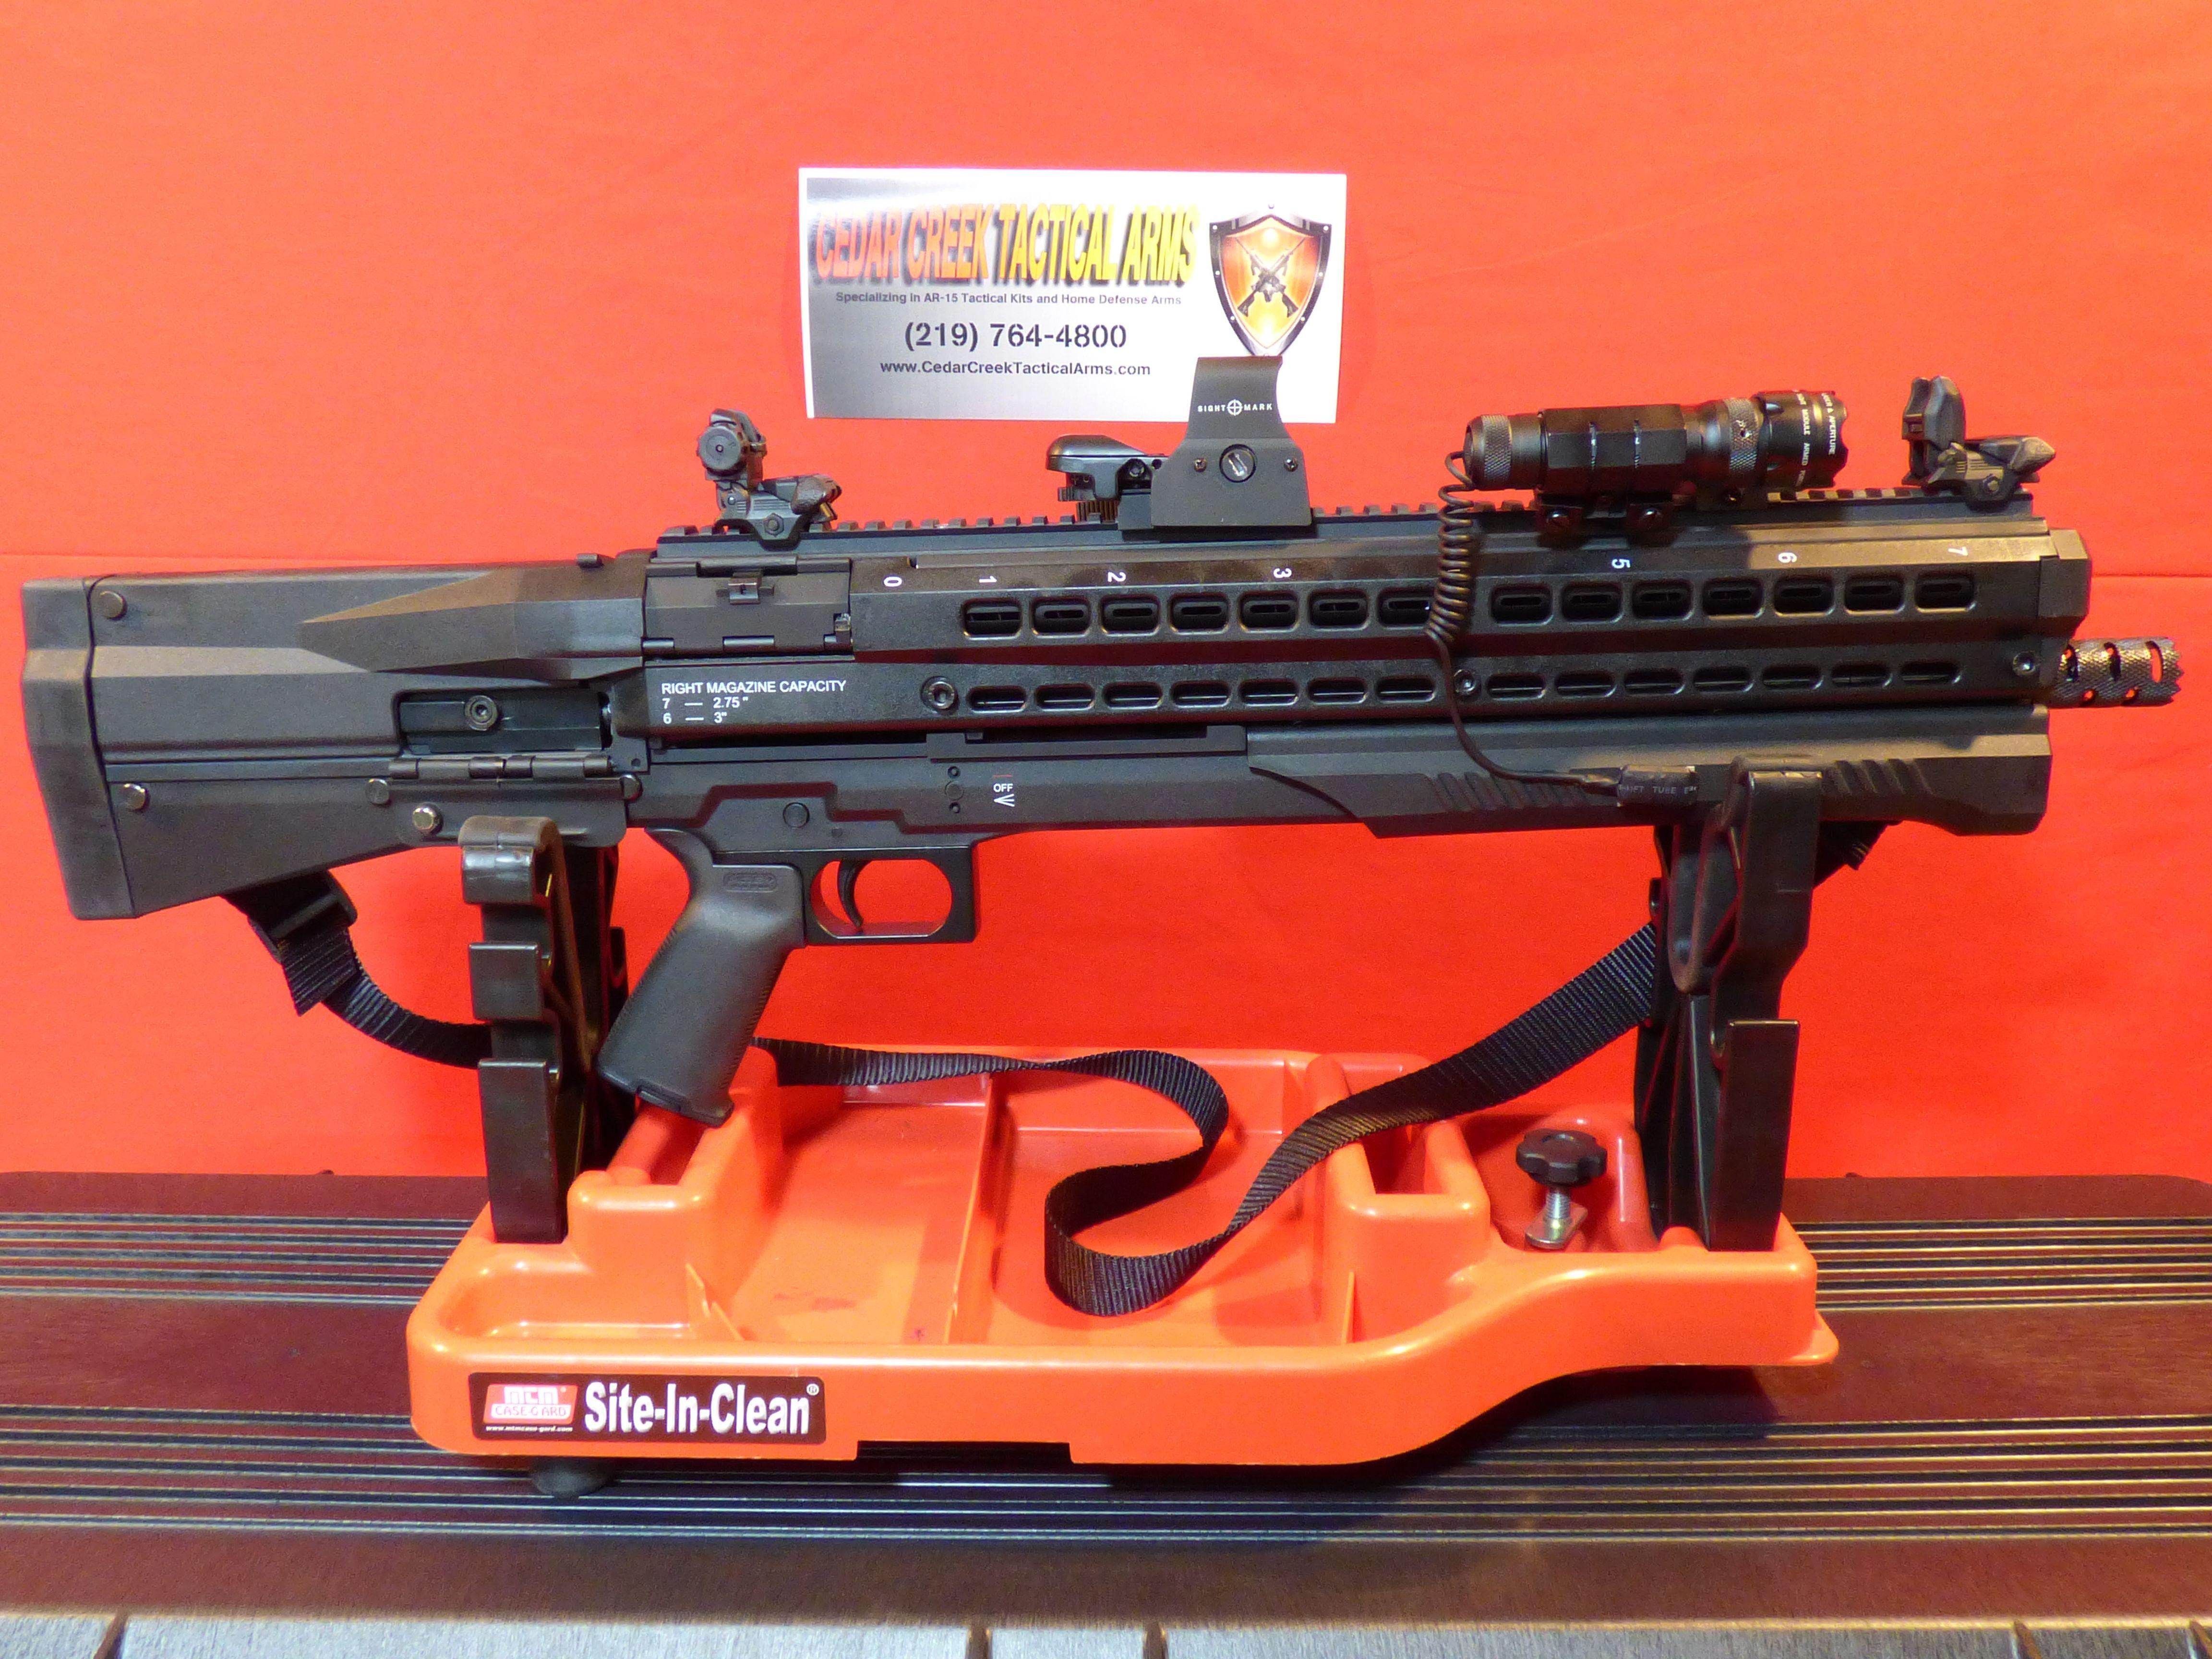 UTAS Bullpup Shotgun Tactical Kit visit us at